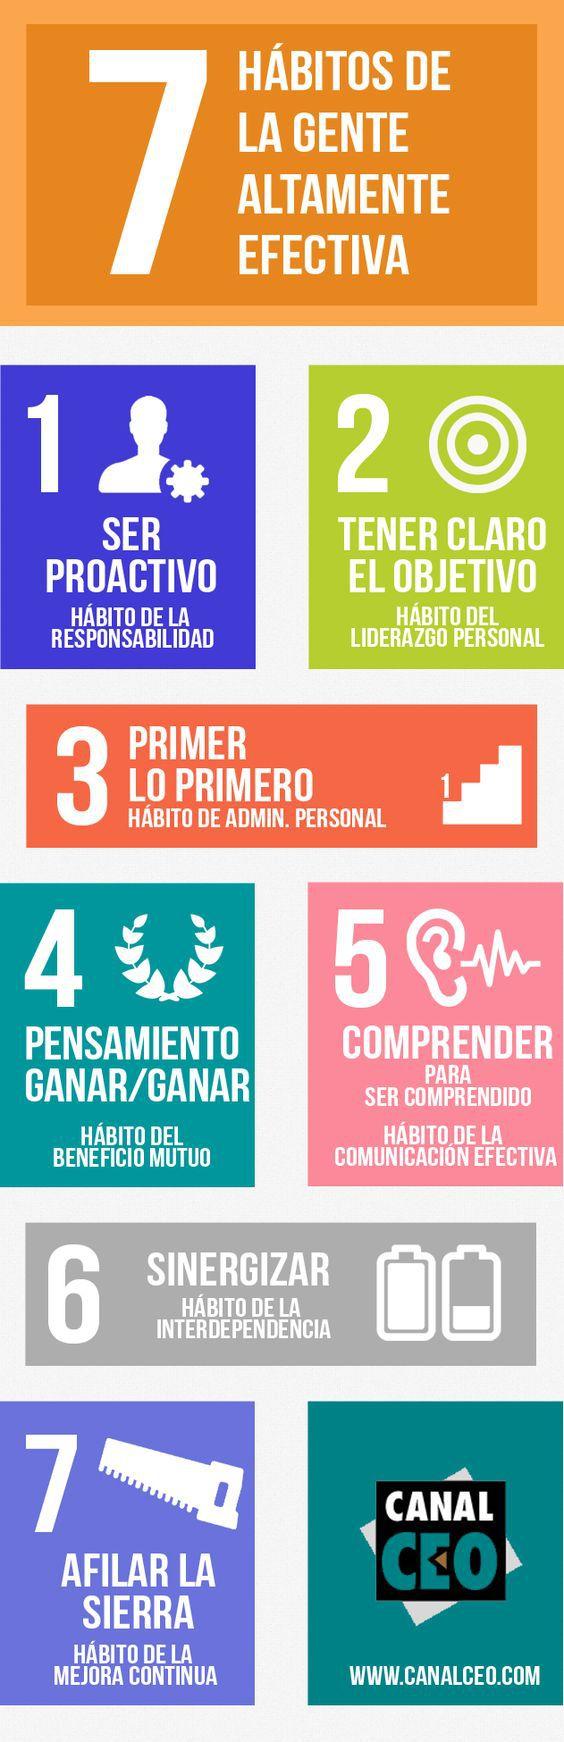 7 hábitos de la gente altamente efectiva #infografia #infographic #productividad